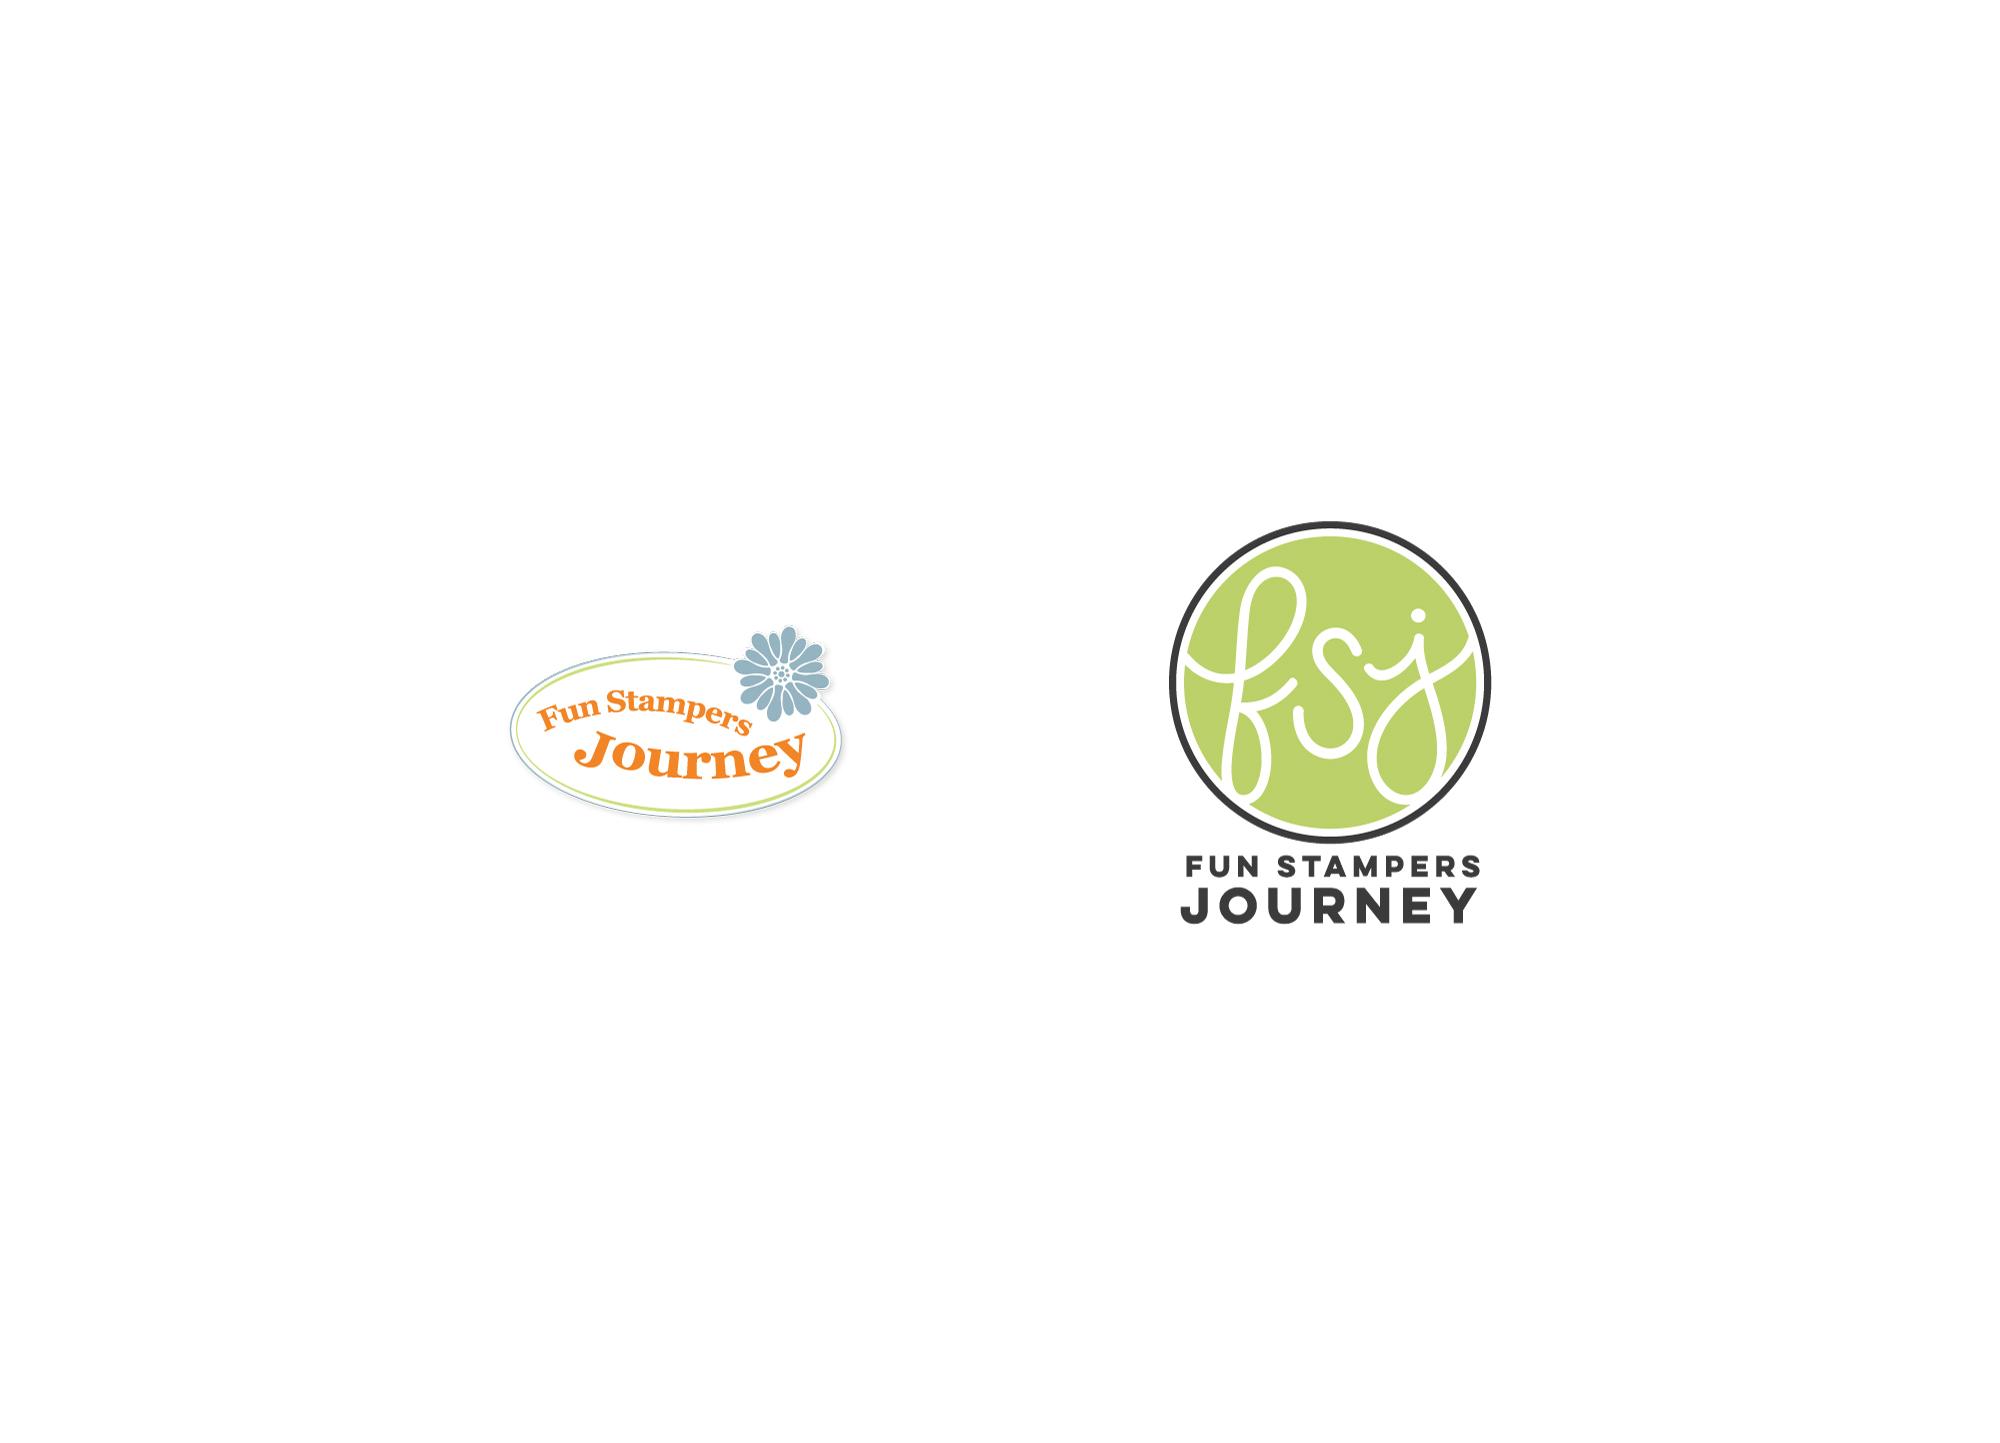 FSJ-Logo-Mockup.jpg